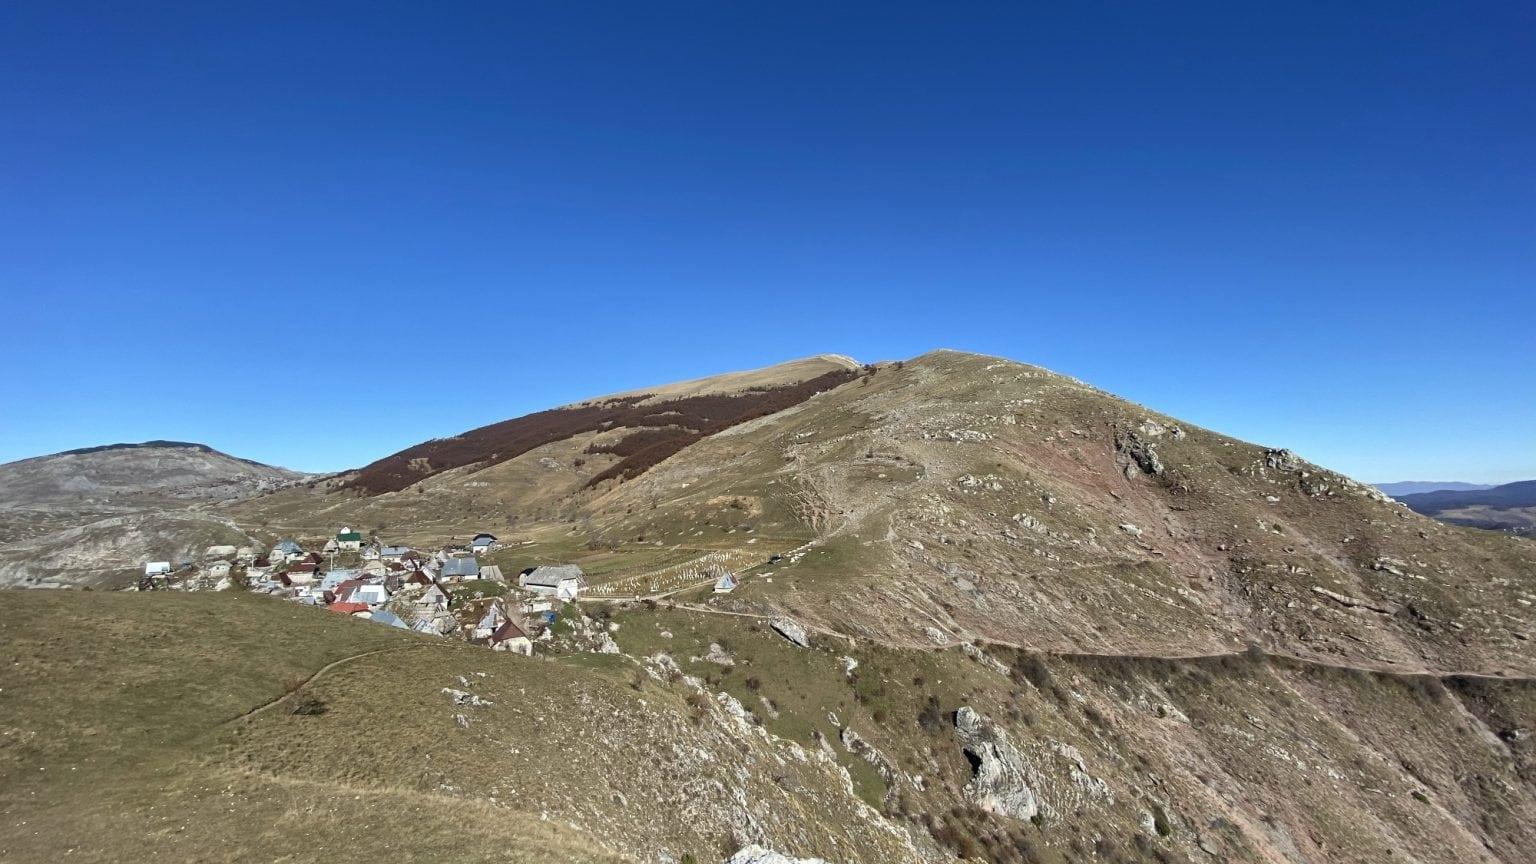 So close to heaven - In The Mountain Village Lukomir 10